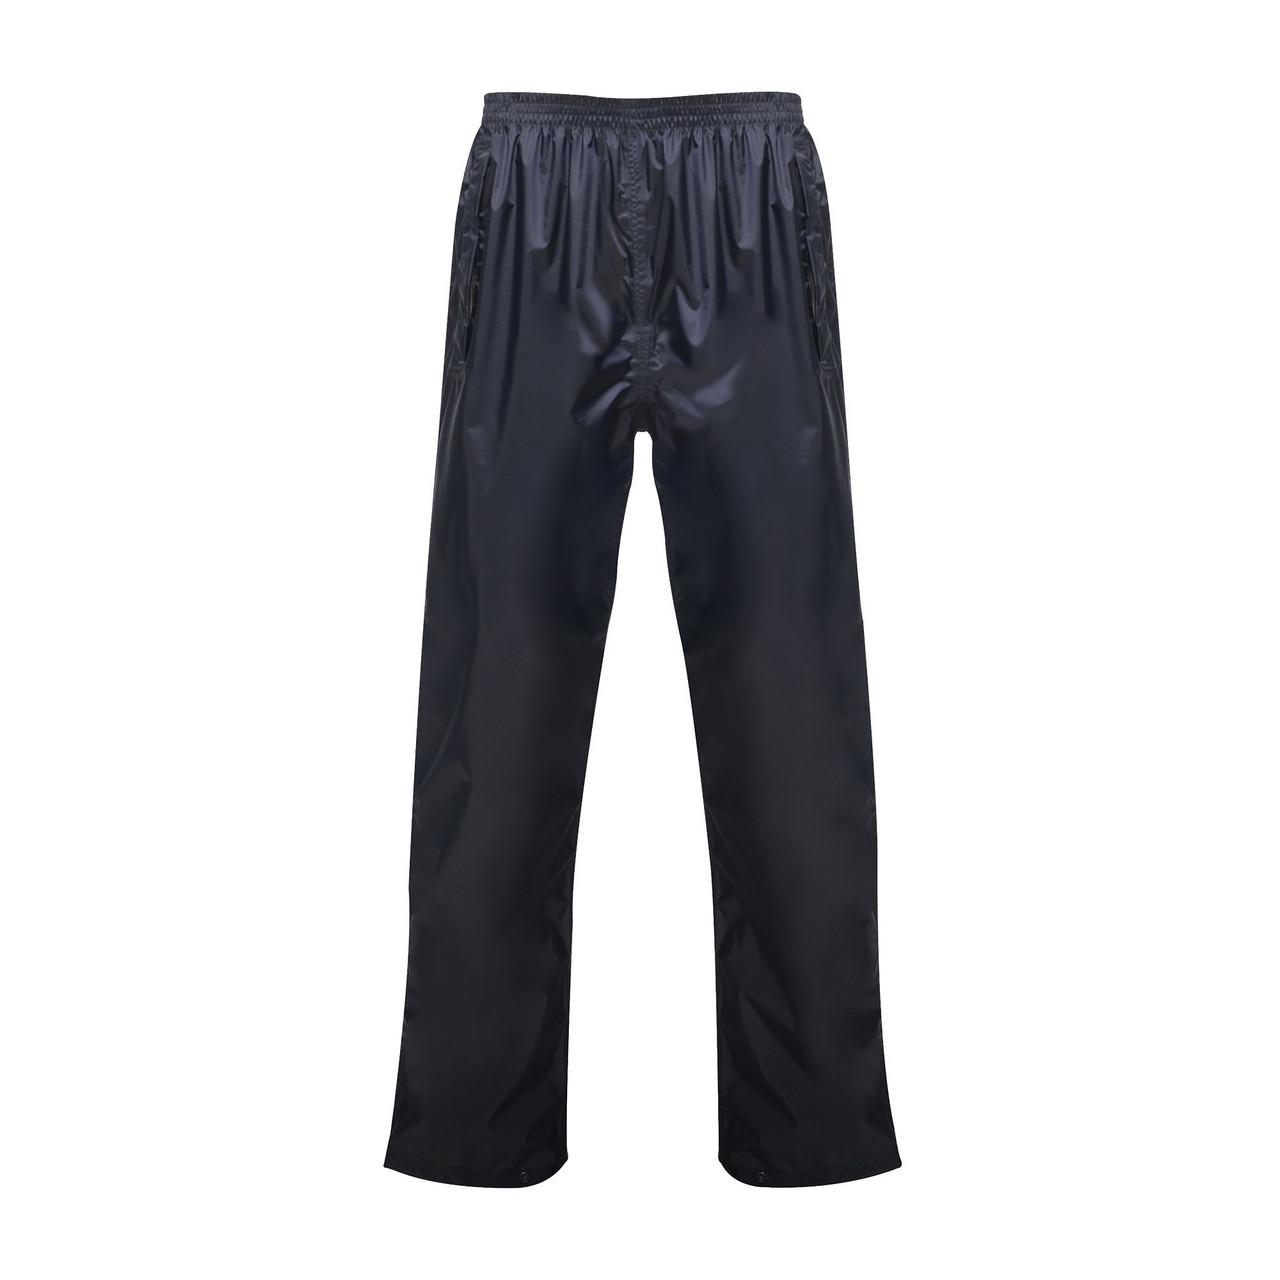 Pro Packaway Waterproof Over Trousers